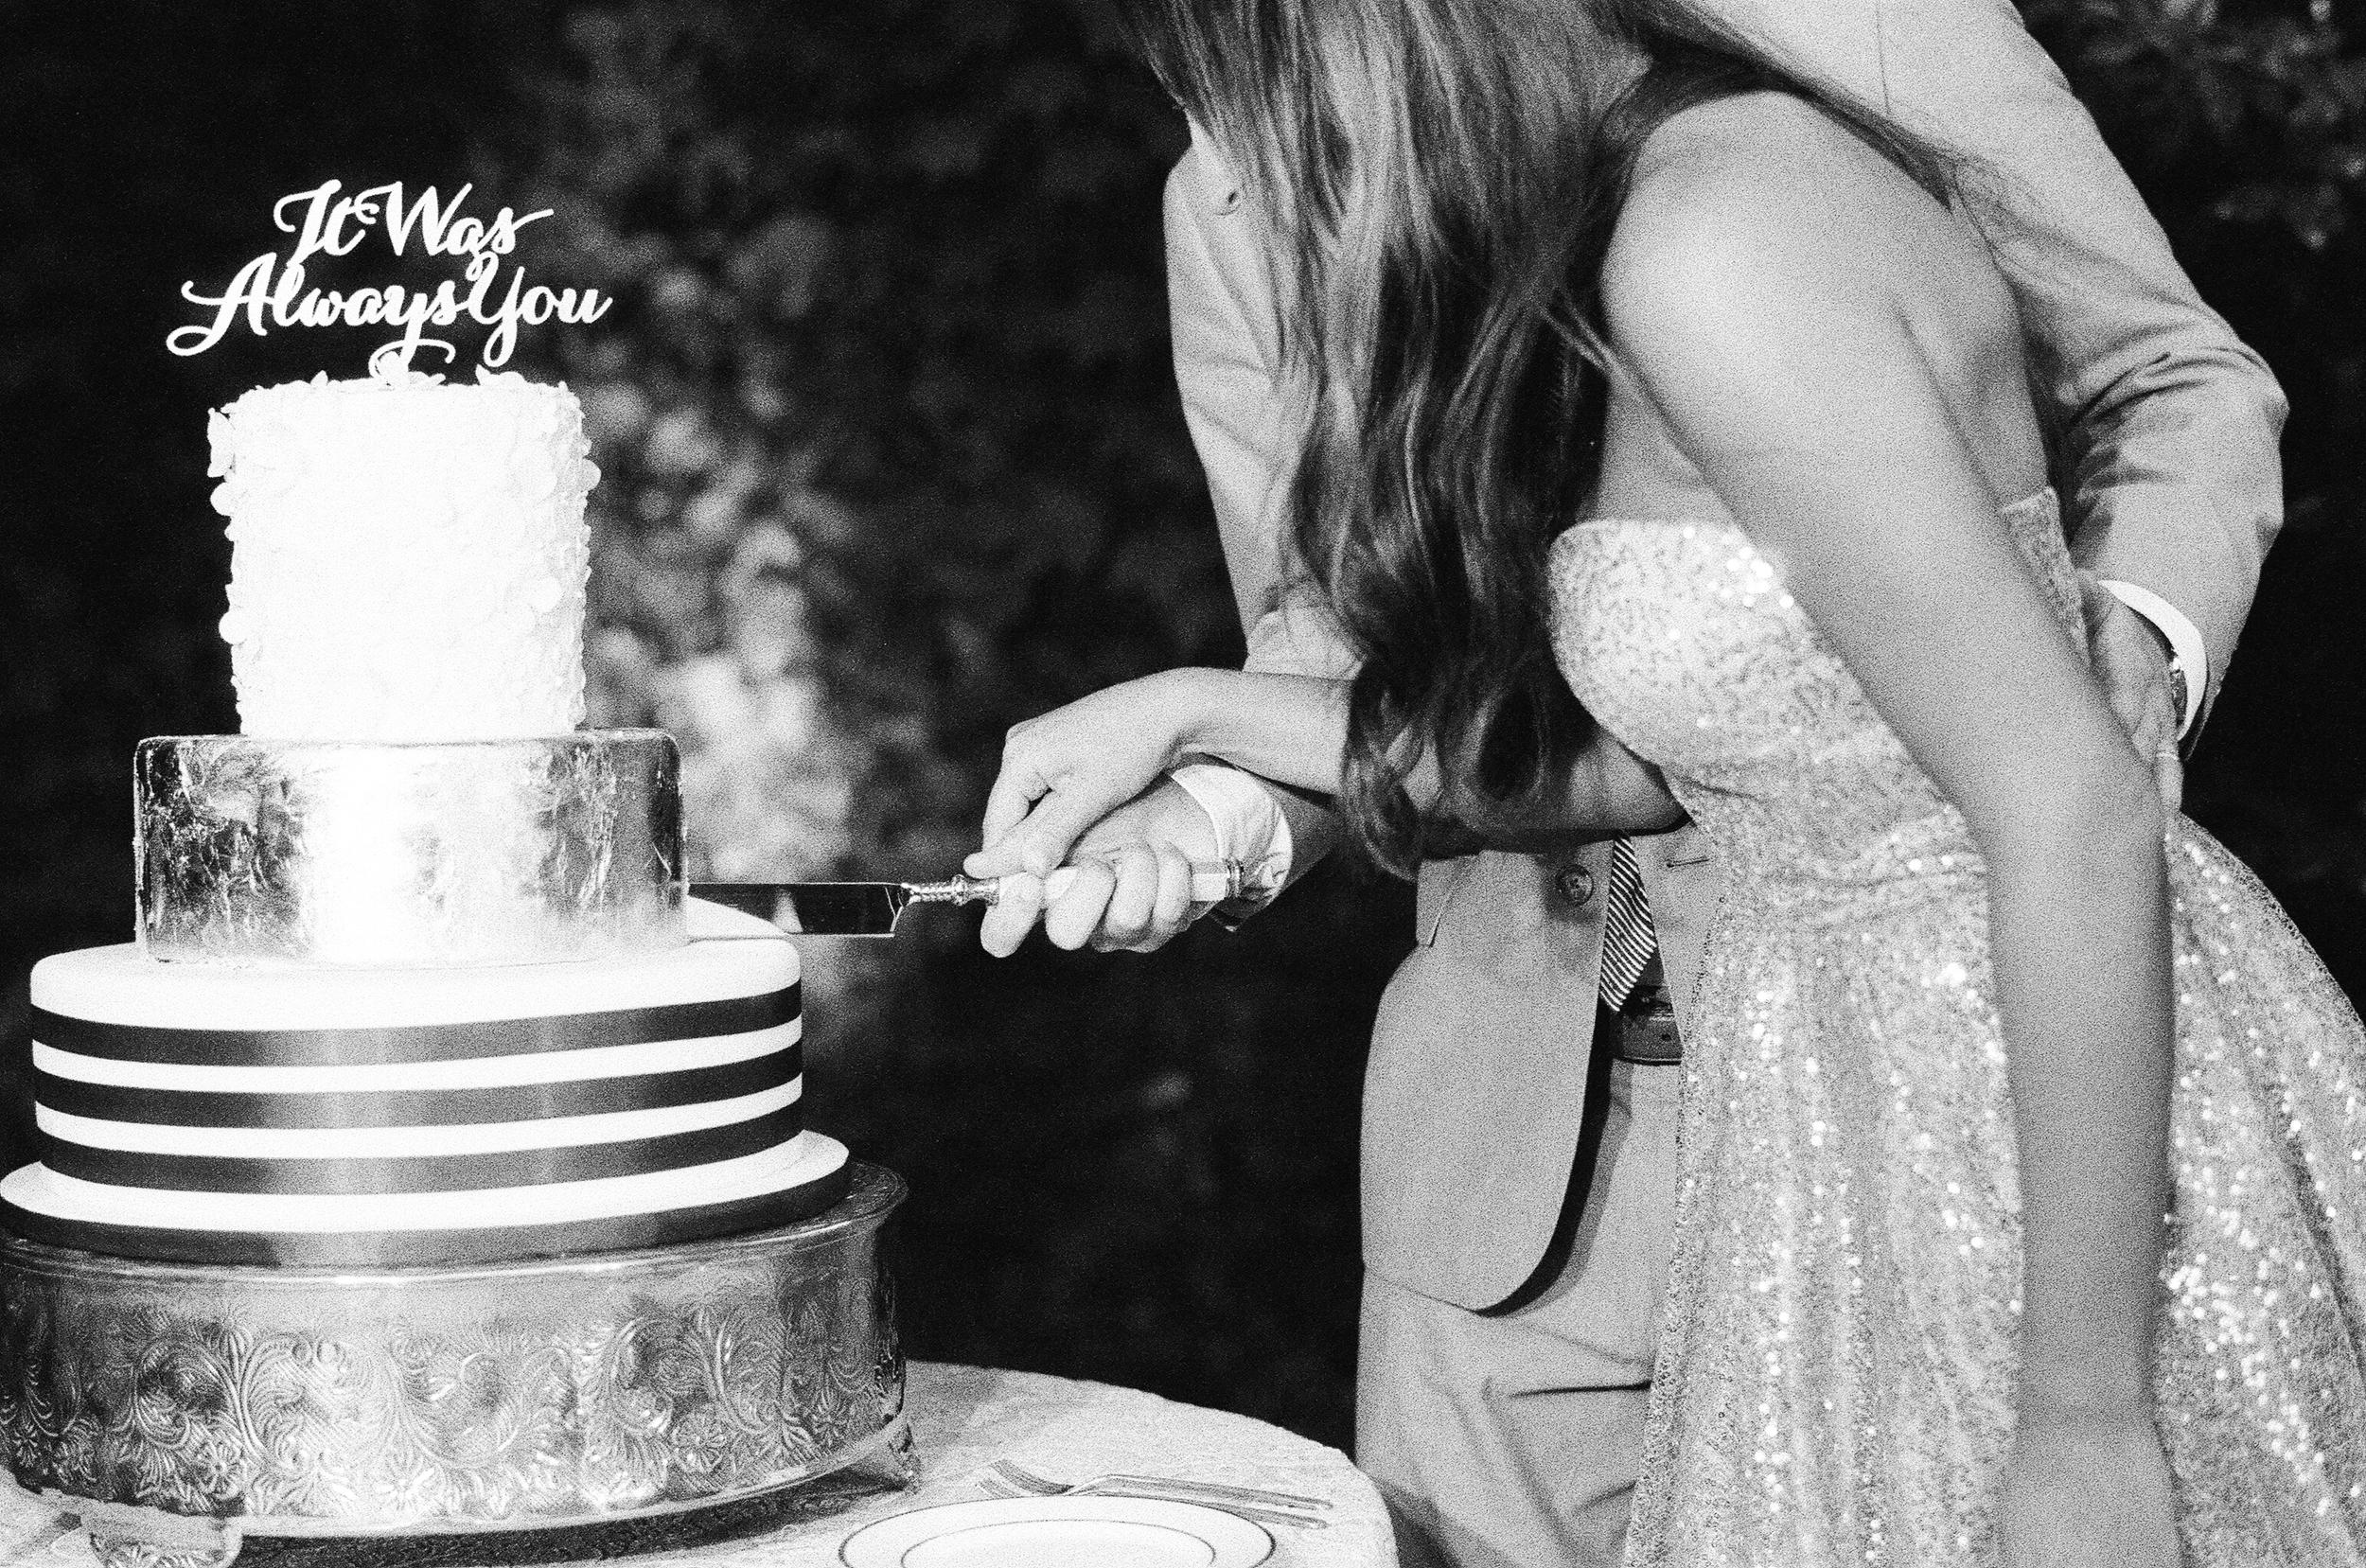 McLoughlin _ Cake Cutting _ 007#9A77.jpg